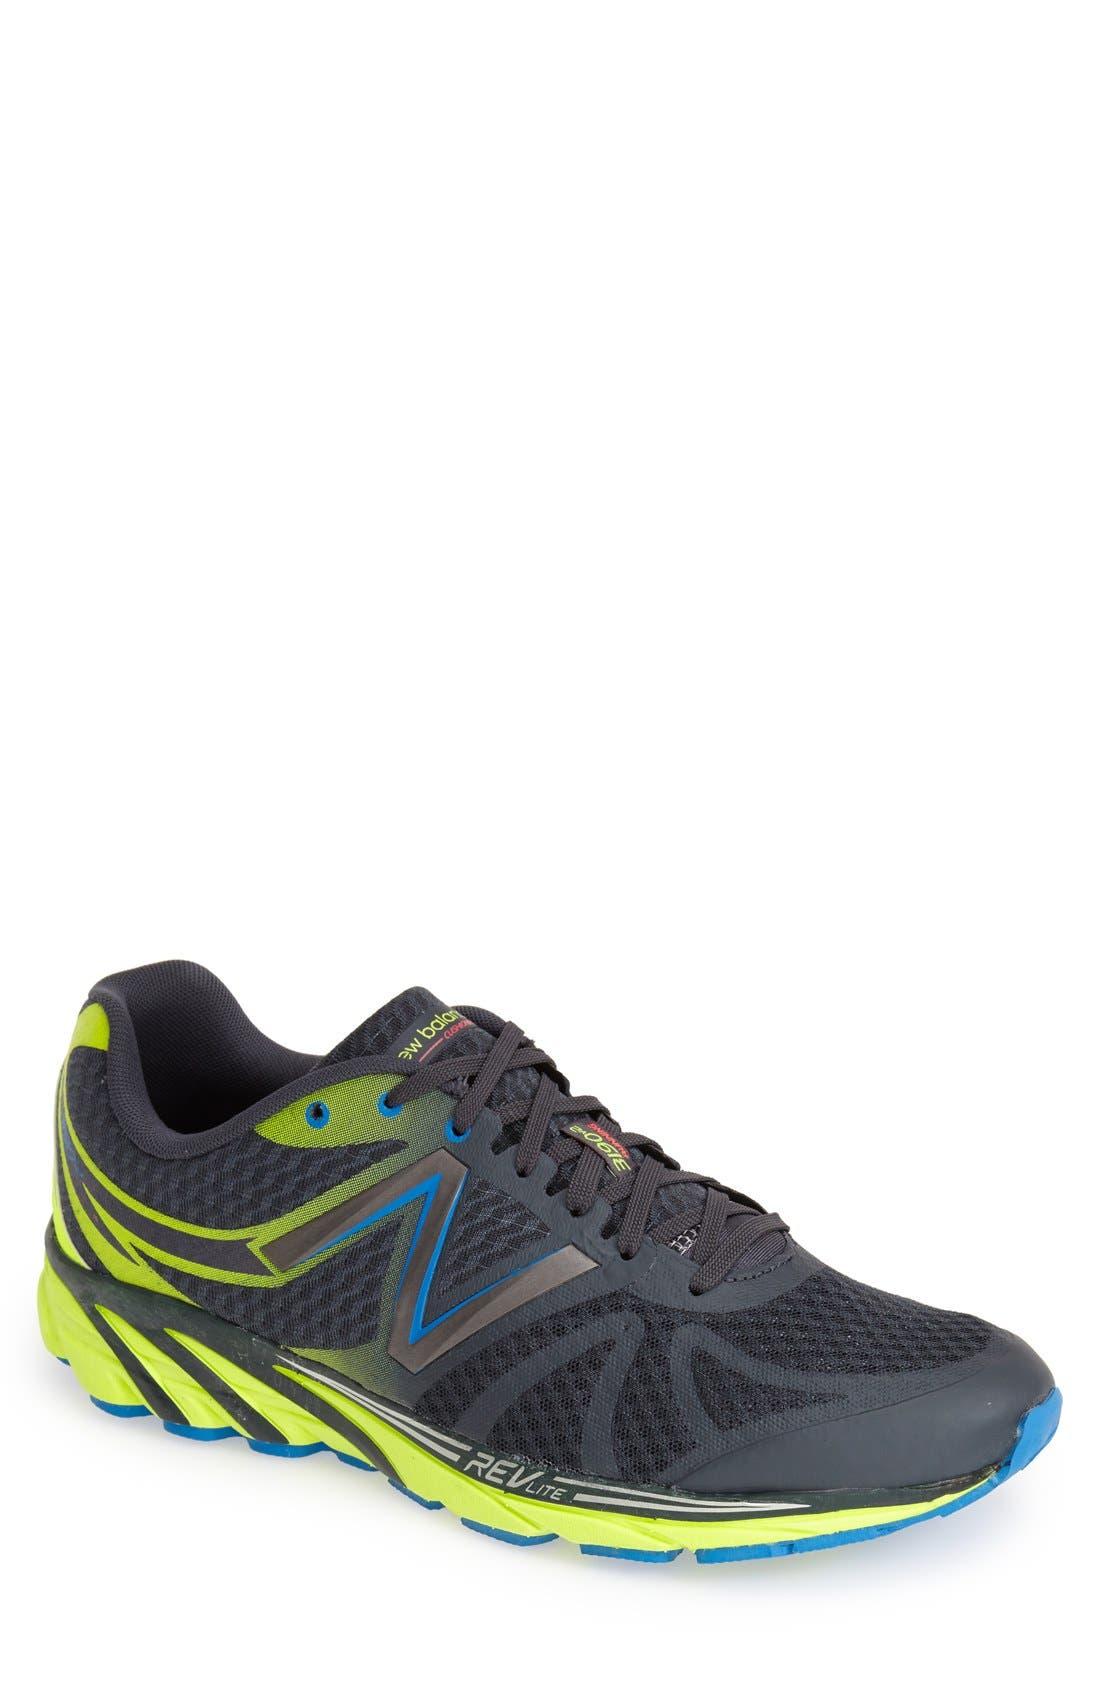 NEW BALANCE '3190 V2' Running Shoe, Main, color, 033